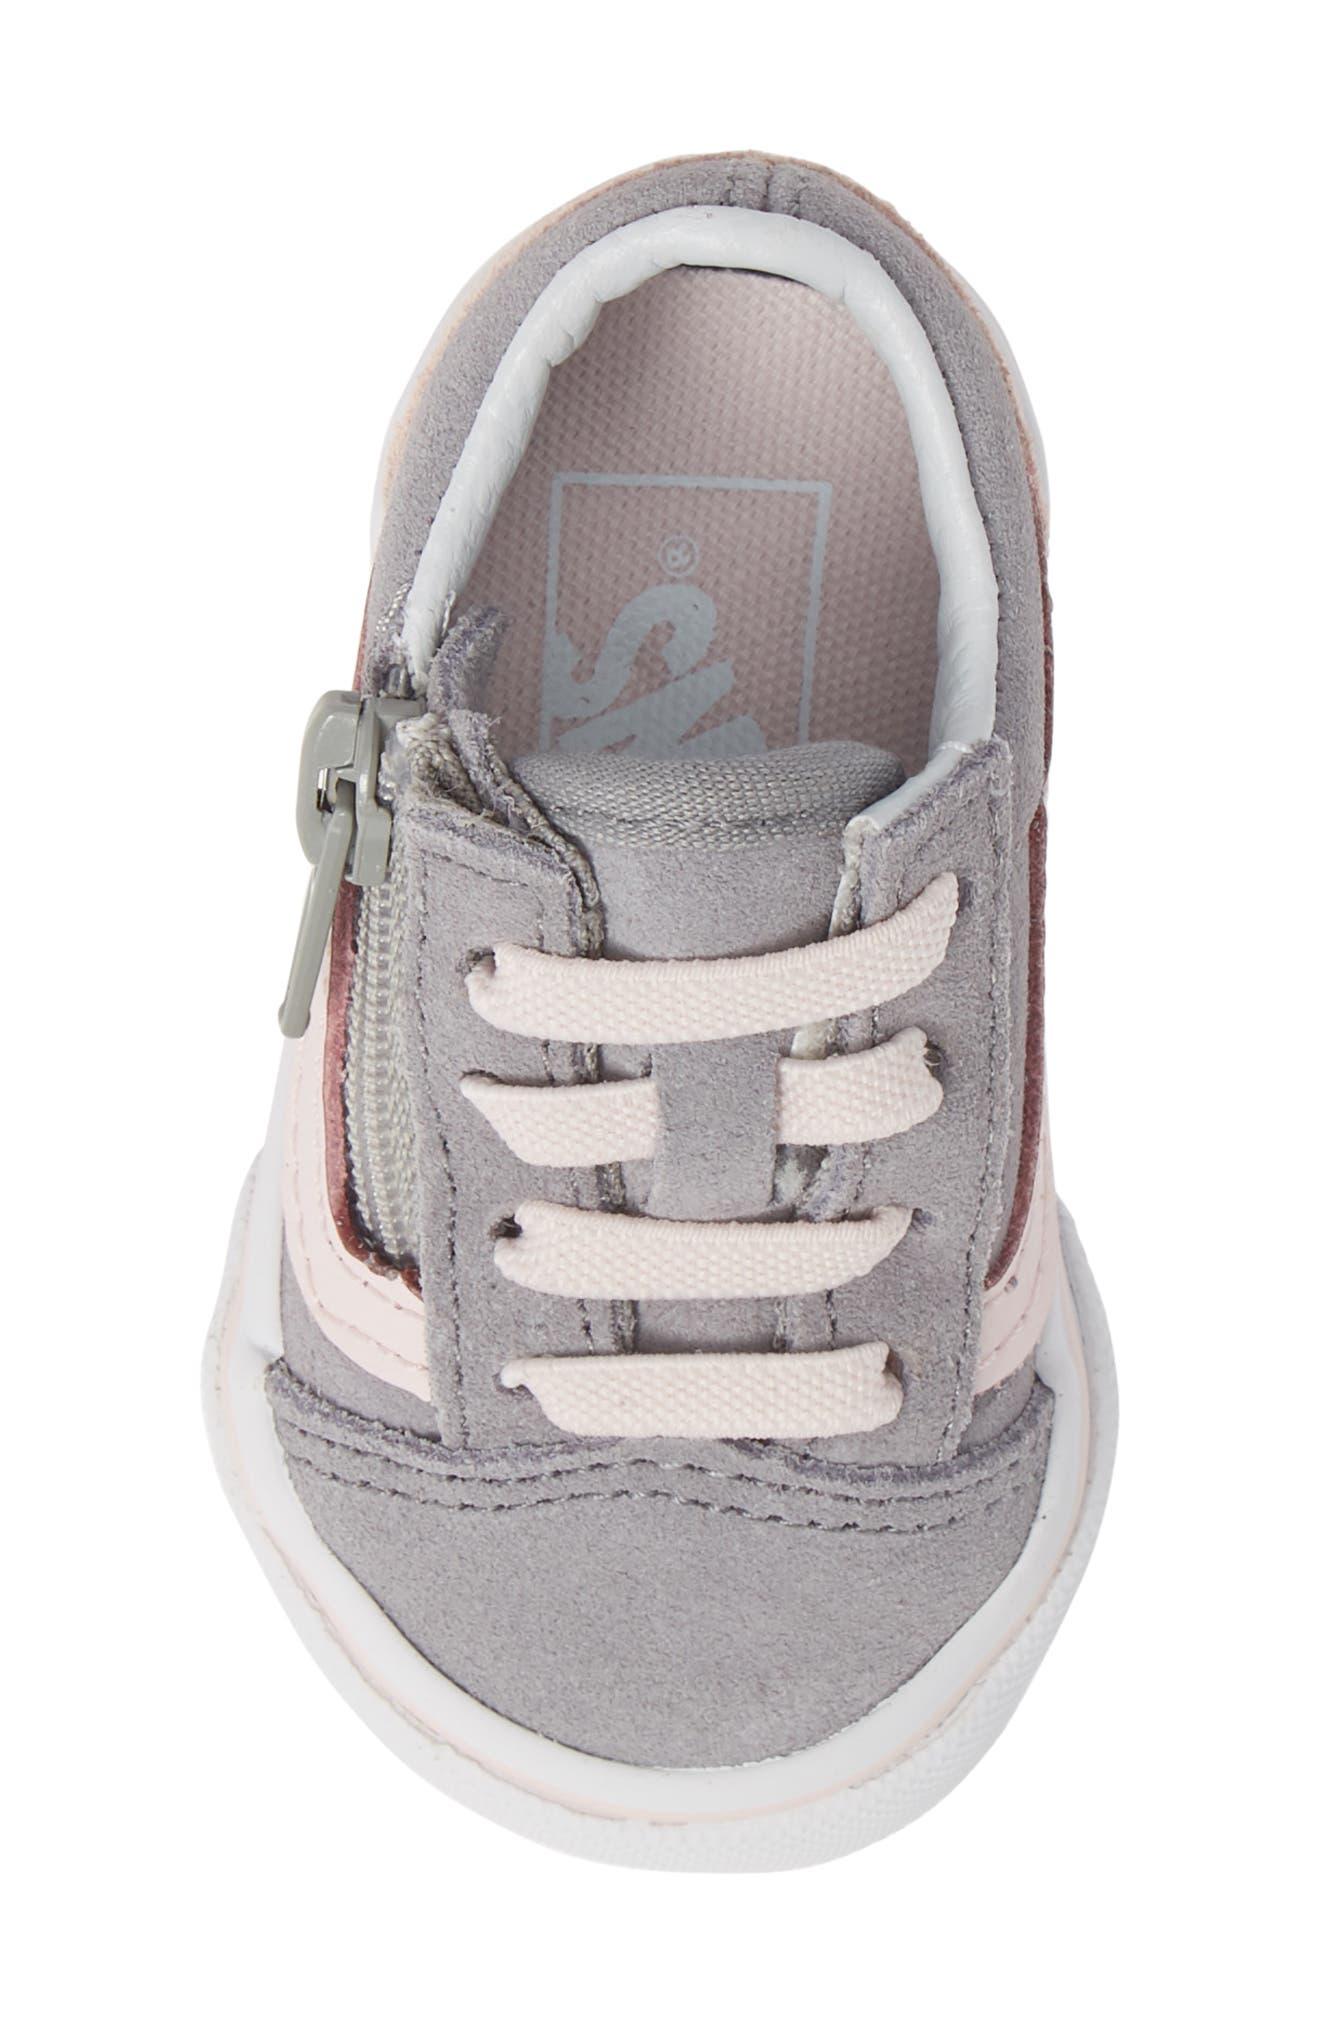 Old Skool Zip Sneaker,                             Alternate thumbnail 5, color,                             SUEDE ALLOY/ PINK/ TRUE WHITE